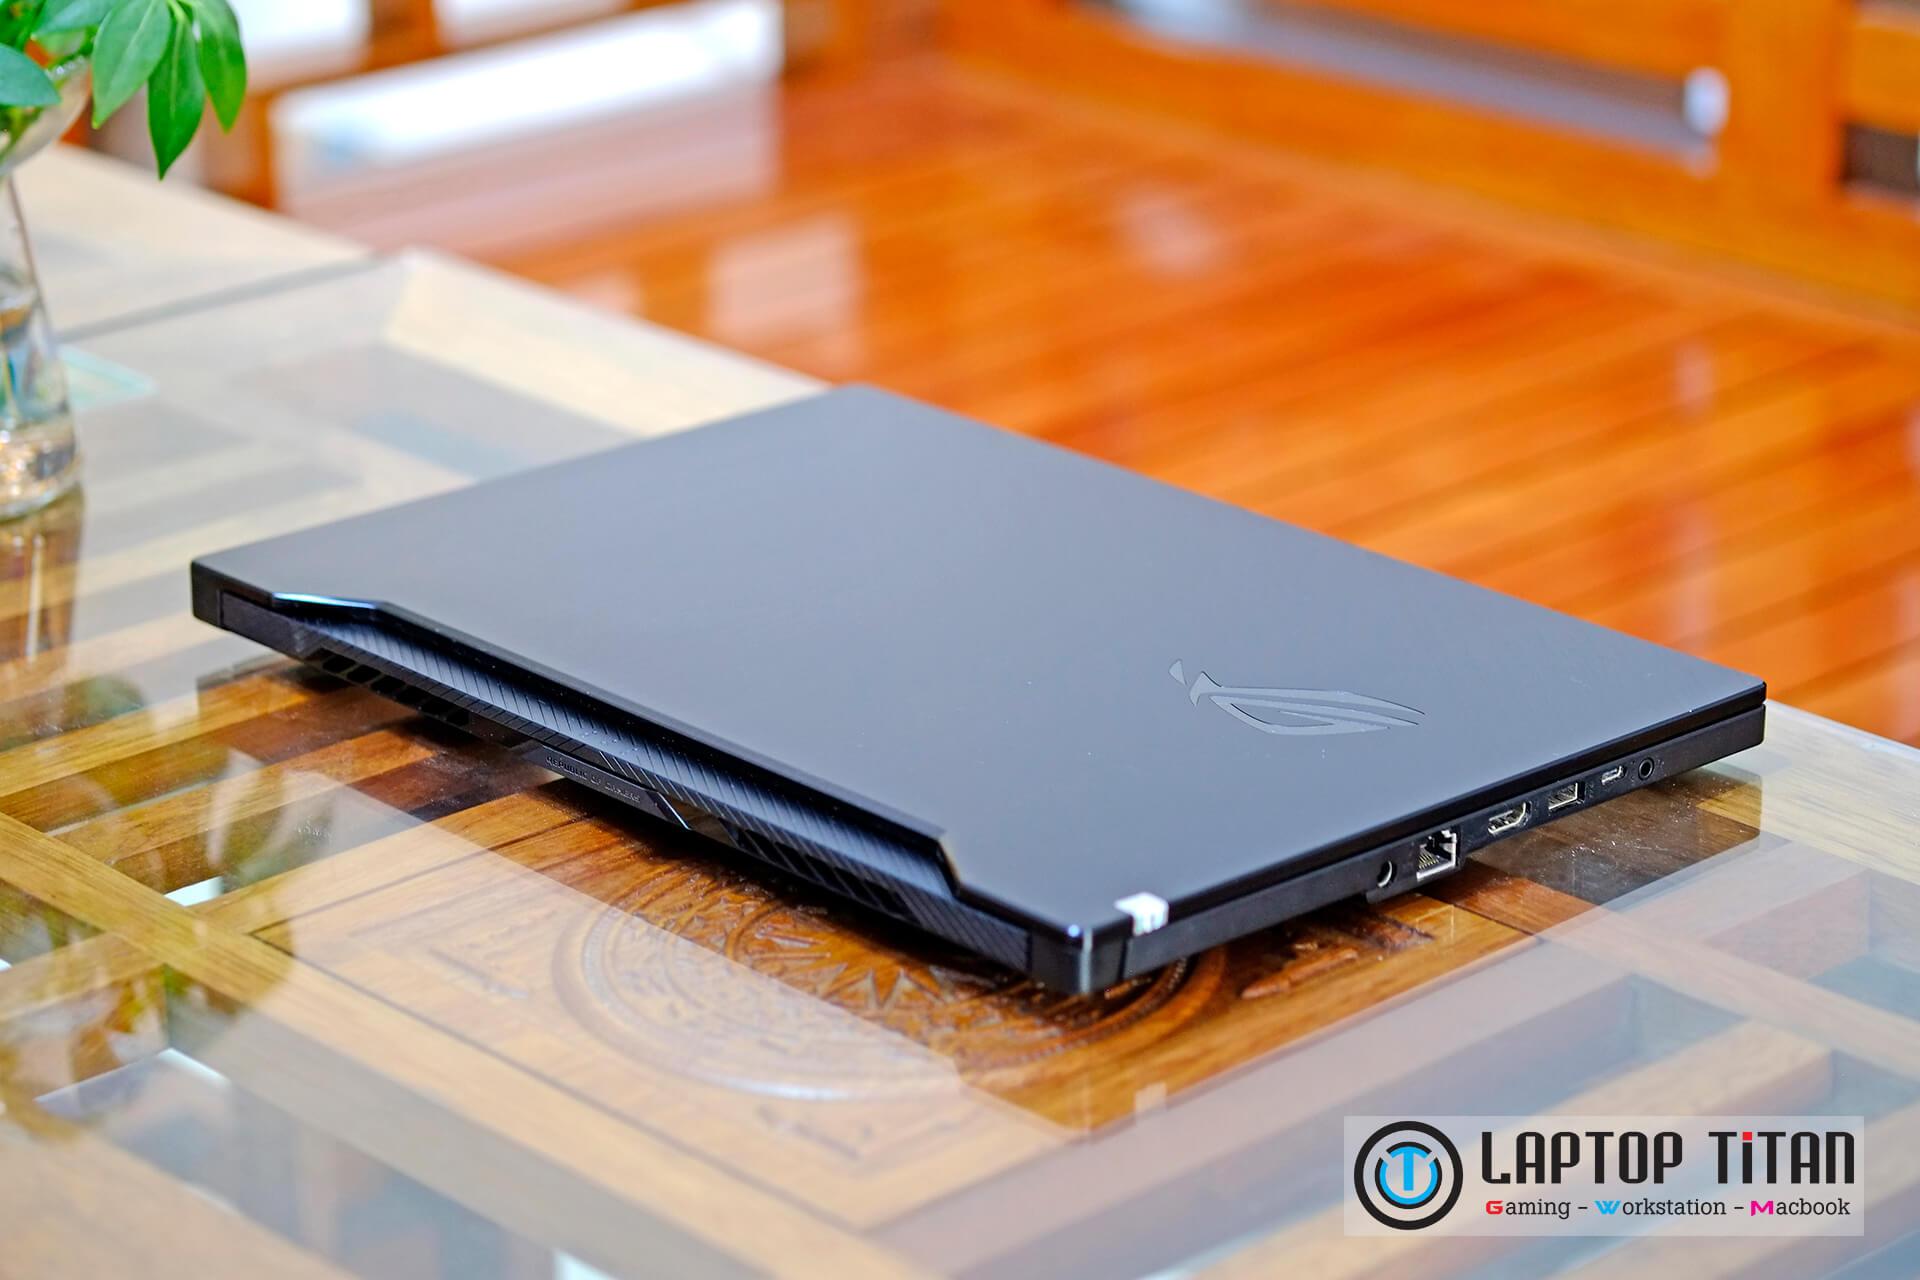 Asus Rog Zephyrus G15 GA502IU laptoptitan.vn 013